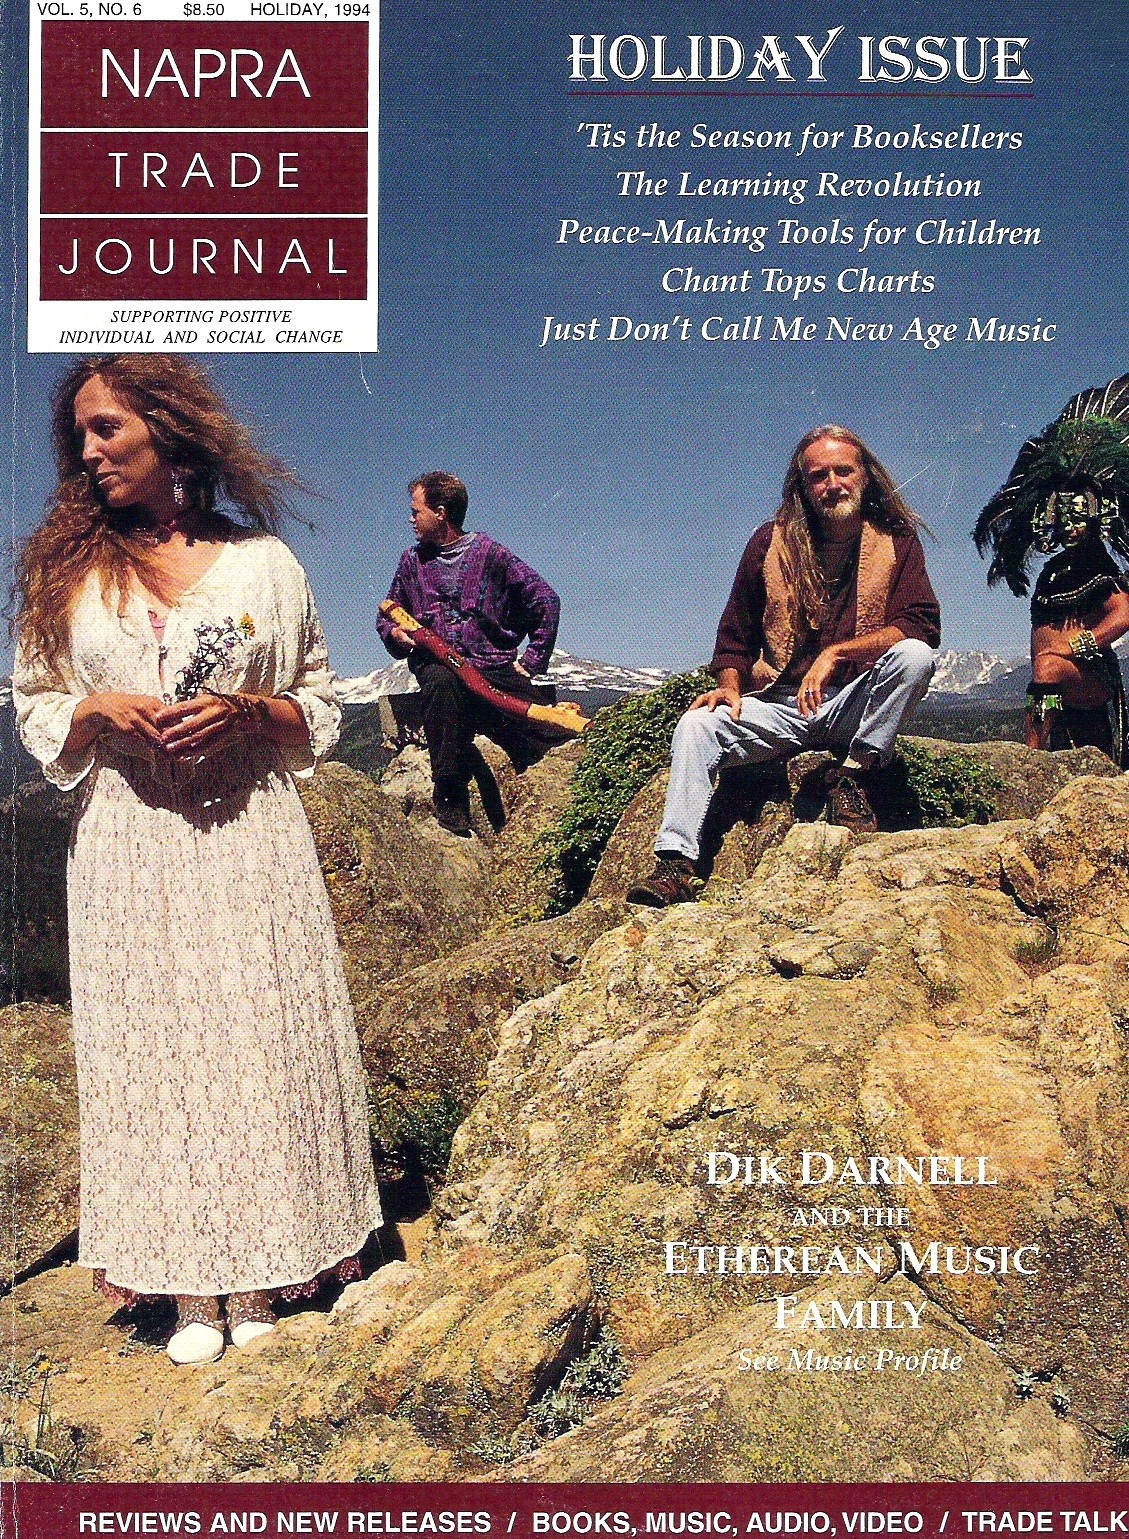 NAPRA Trade Journal